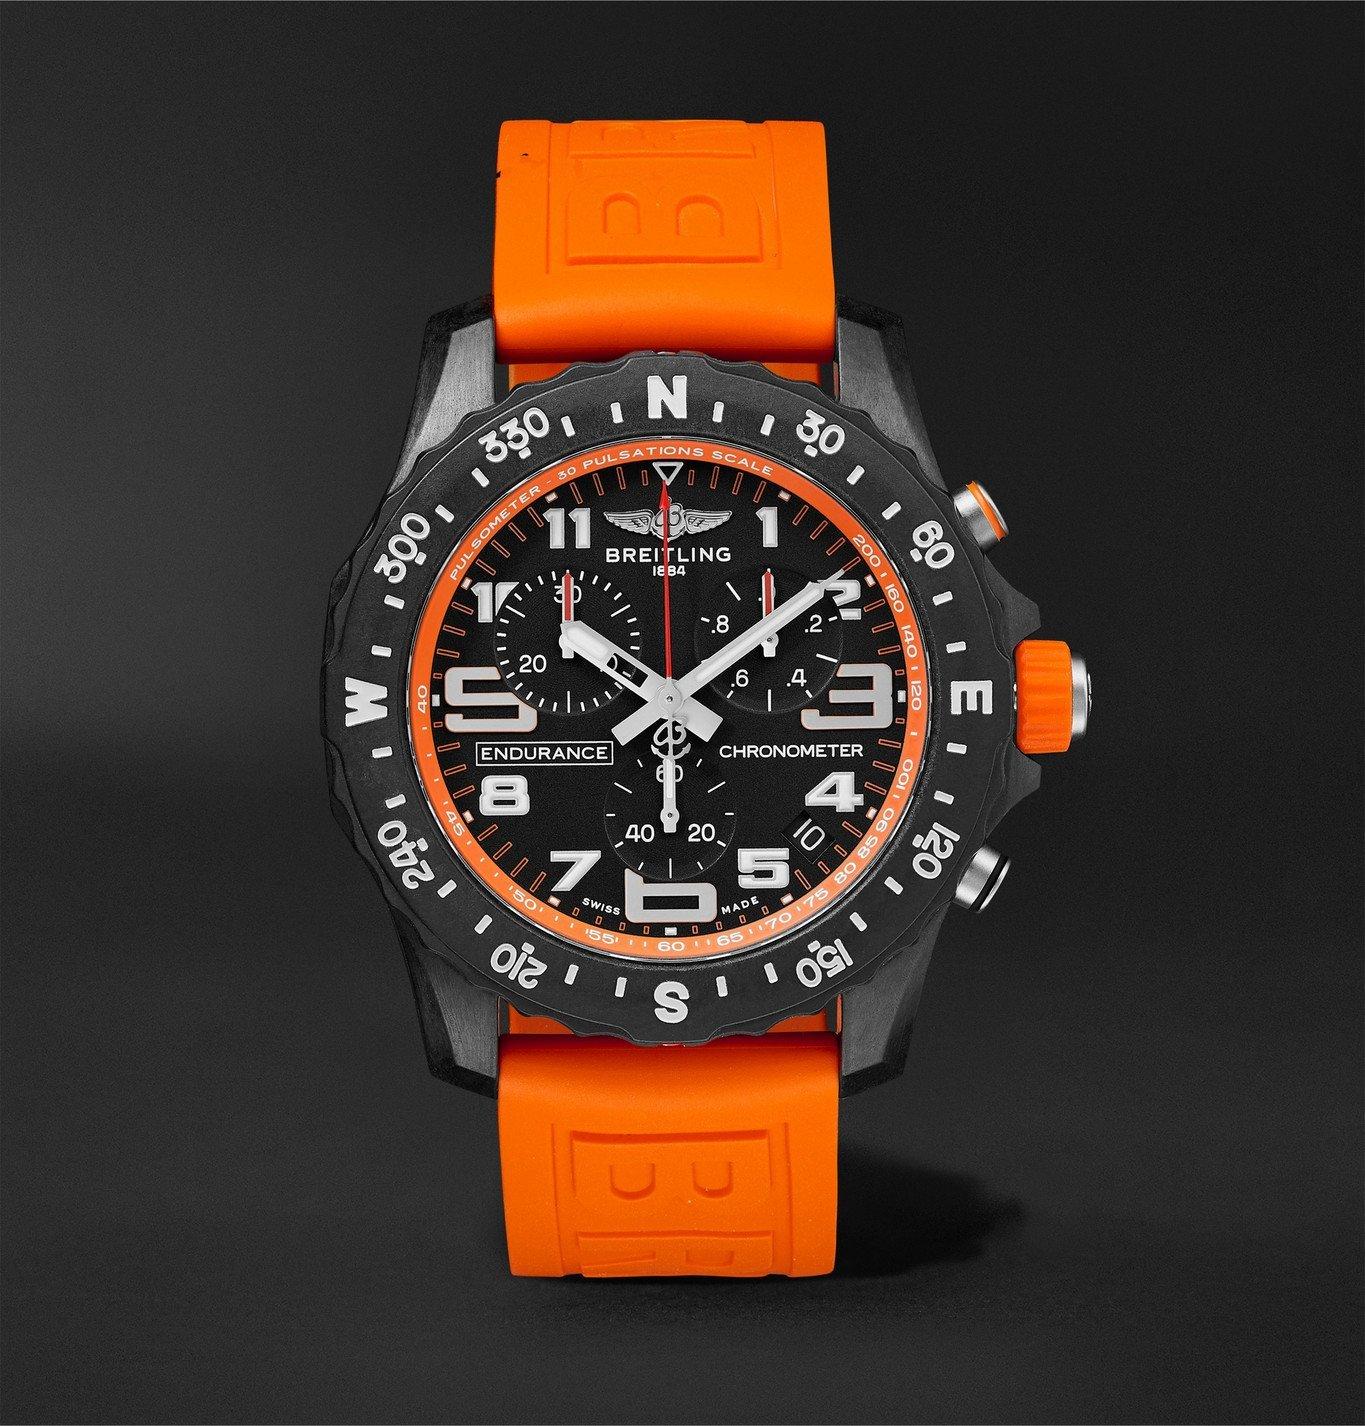 Photo: Breitling - Endurance Pro SuperQuartz Chronograph 44mm Breitlight and Rubber Watch, Ref. No. X82310A51B1S1 - Orange